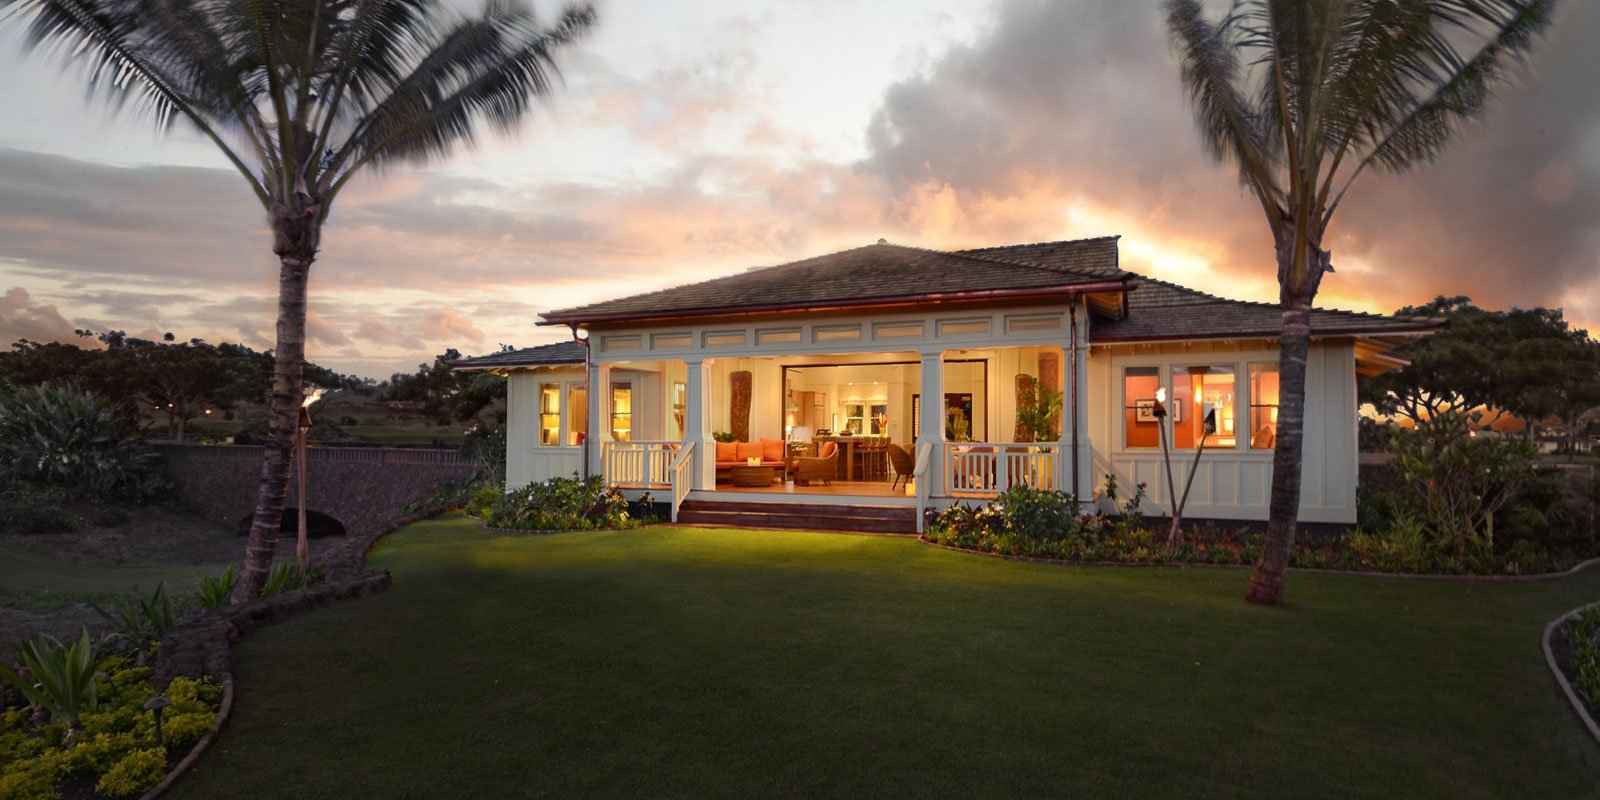 Club Bungalows - Kauai real estate